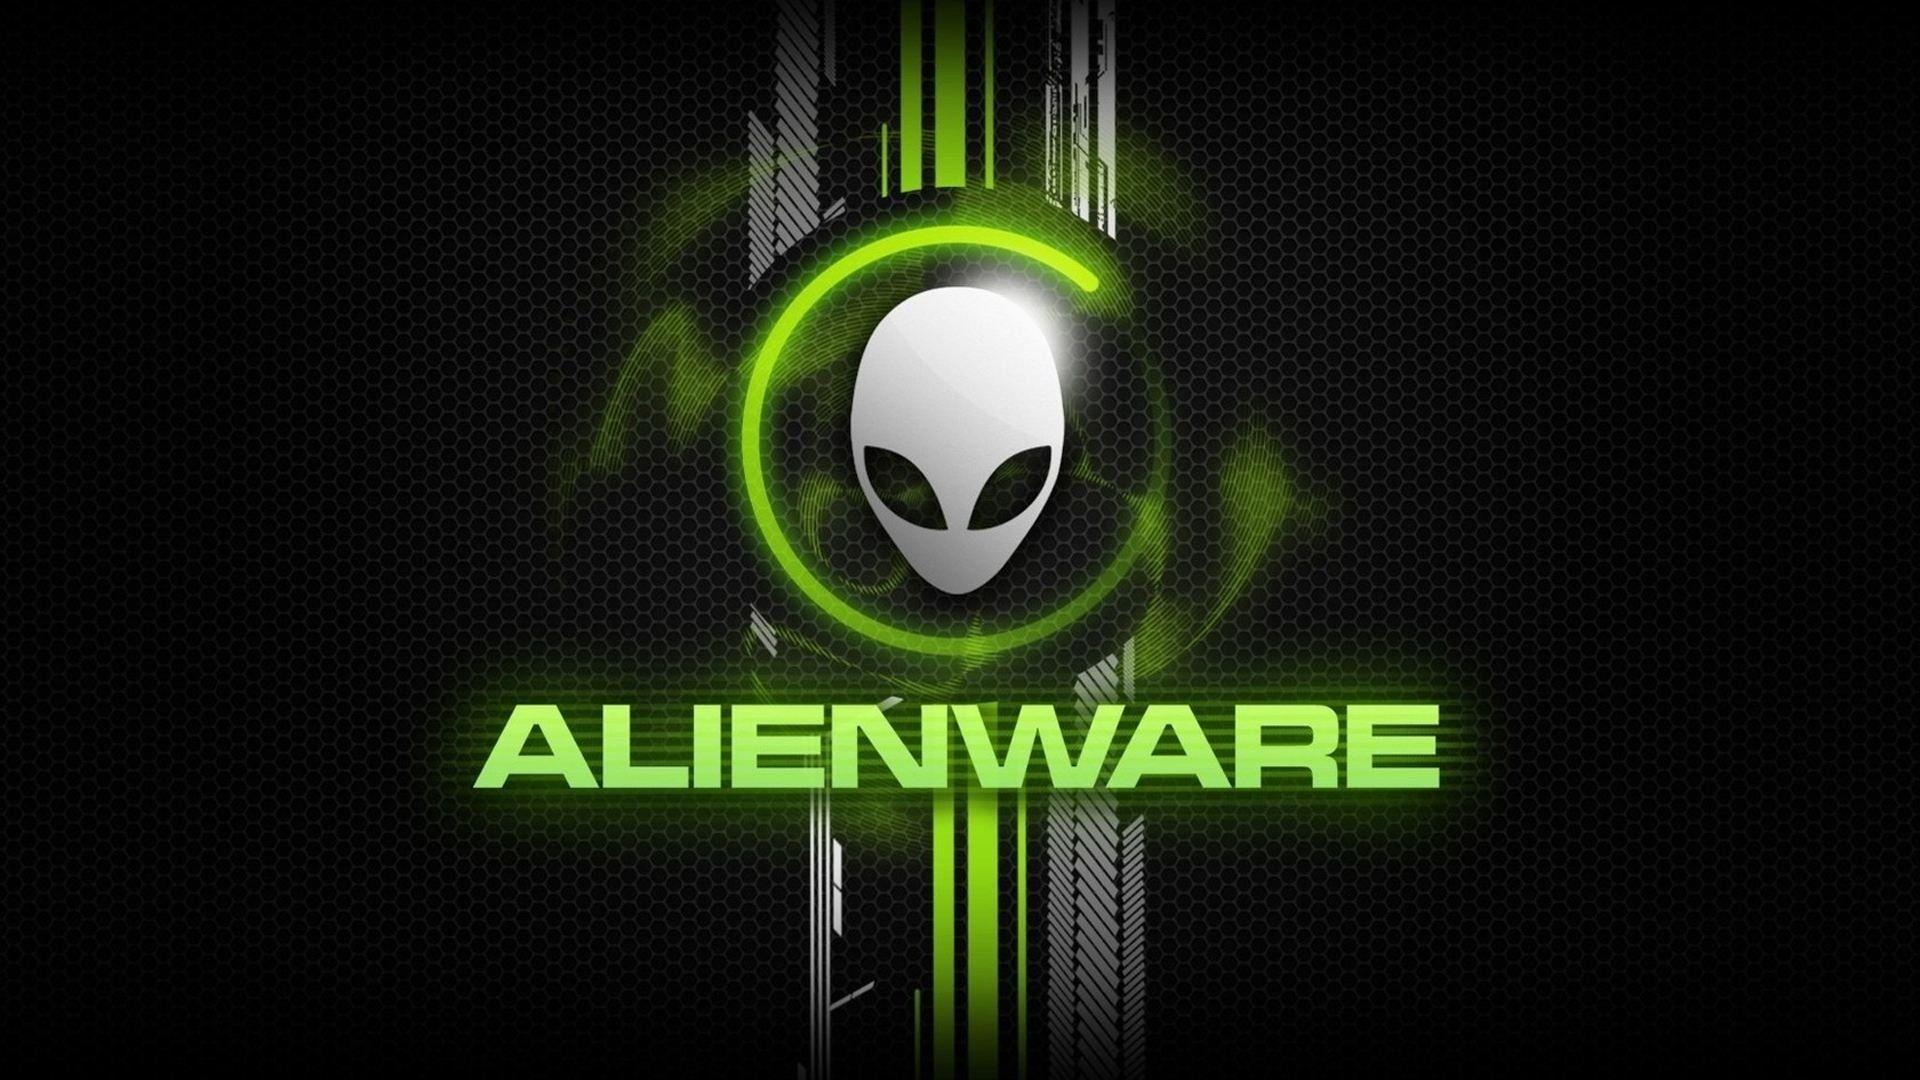 Alien ware green text logo hd wallpaper fondos de